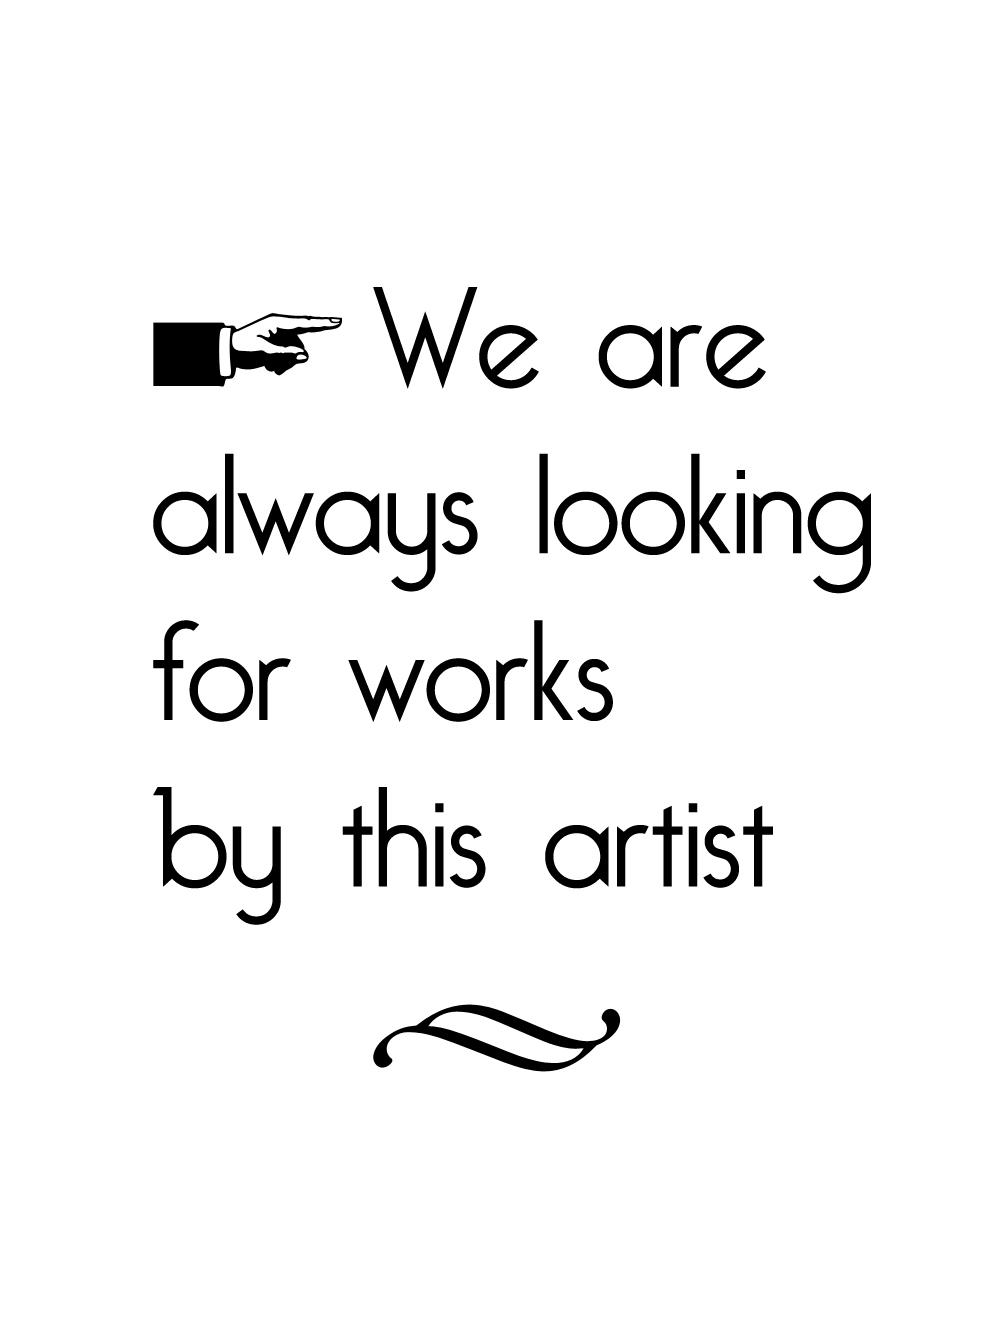 aa-Seeking-Works-image